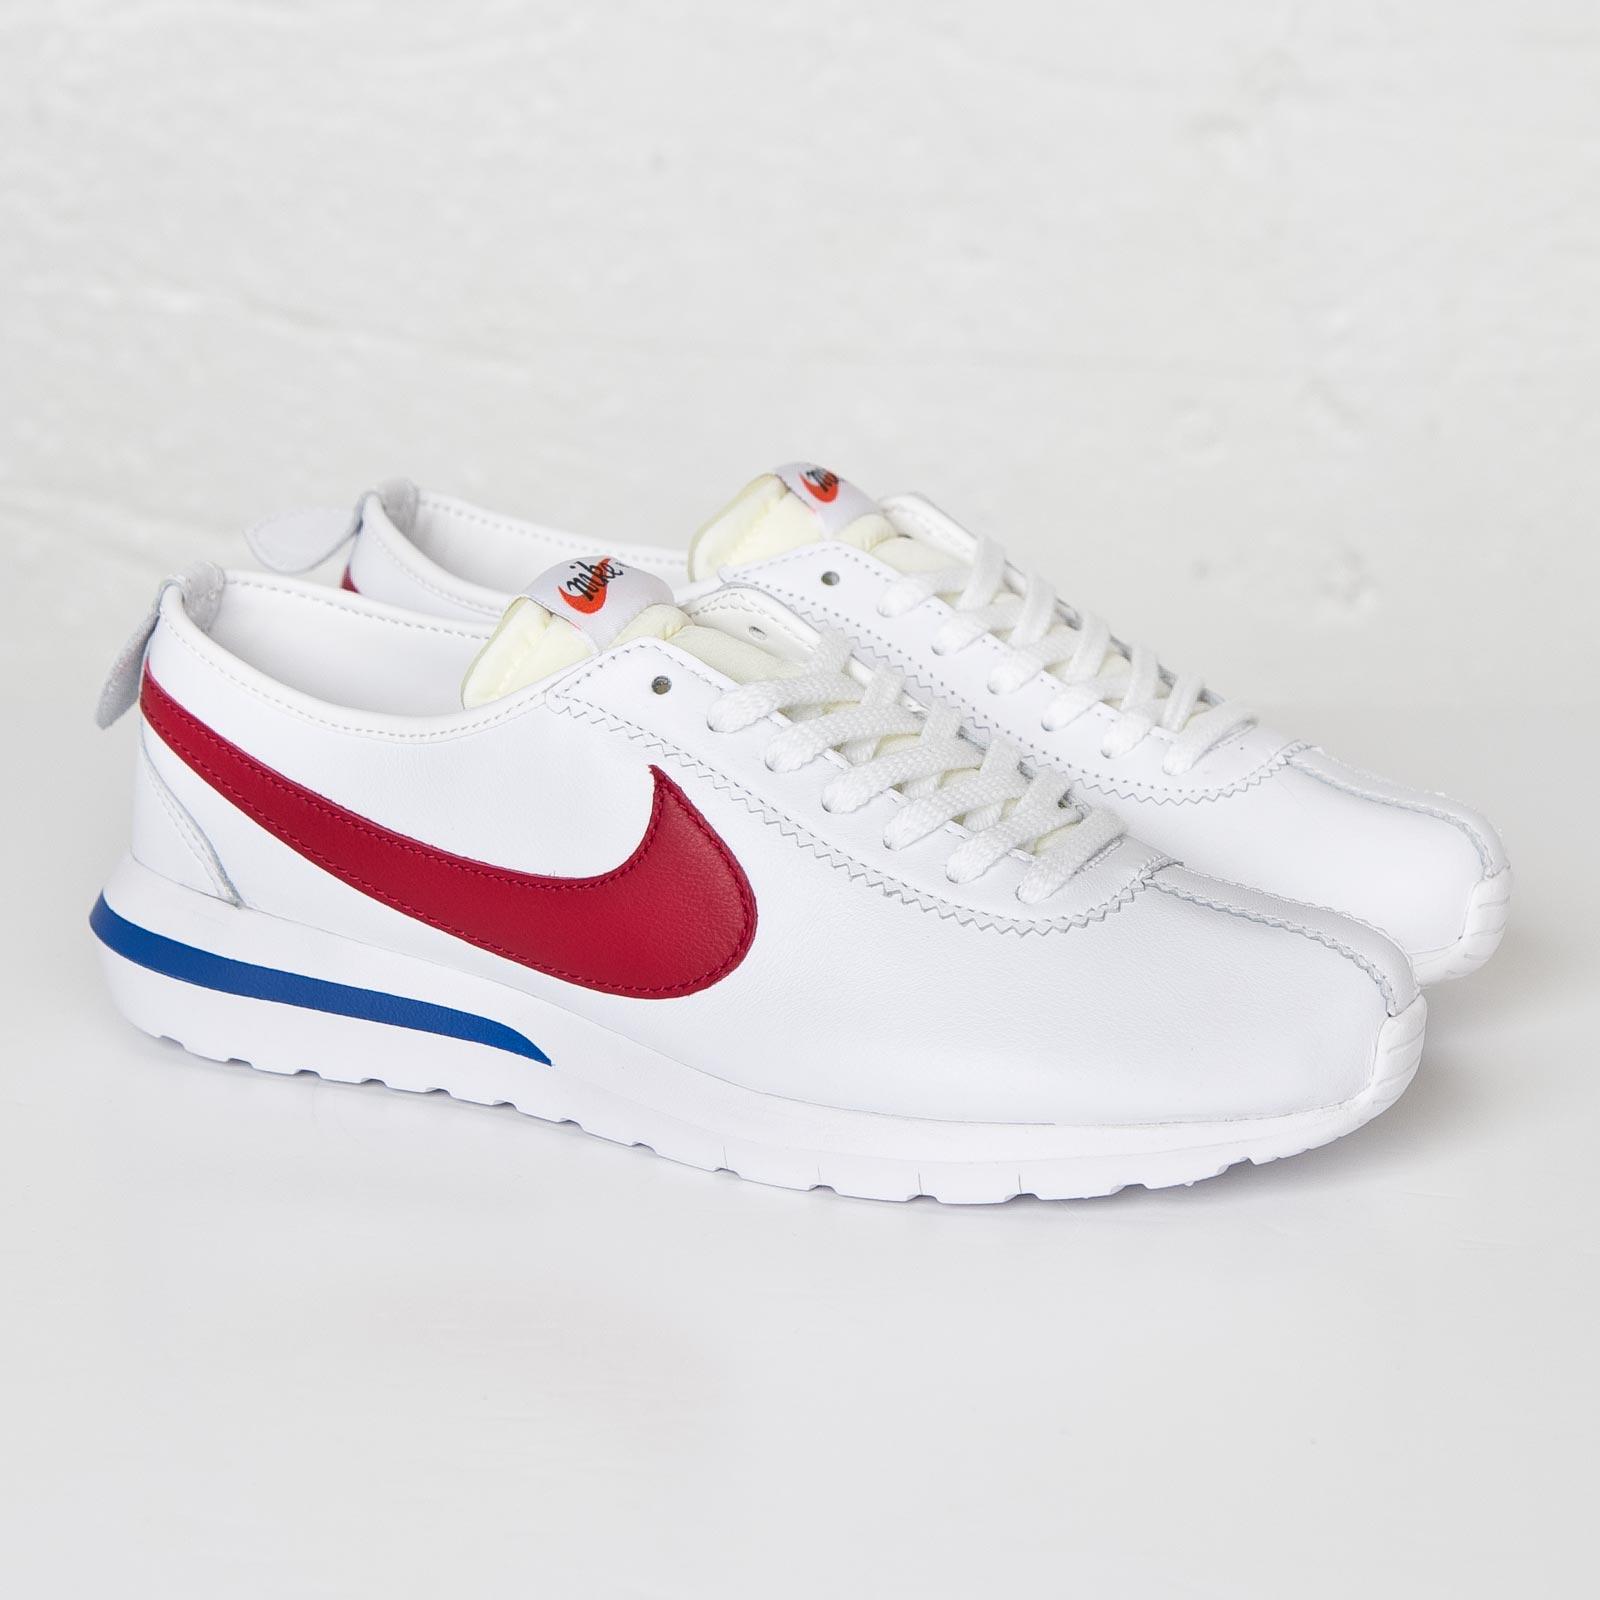 29dcd2e6040 Nike Roshe Cortez Nm SP - 806952-164 - Sneakersnstuff | sneakers ...